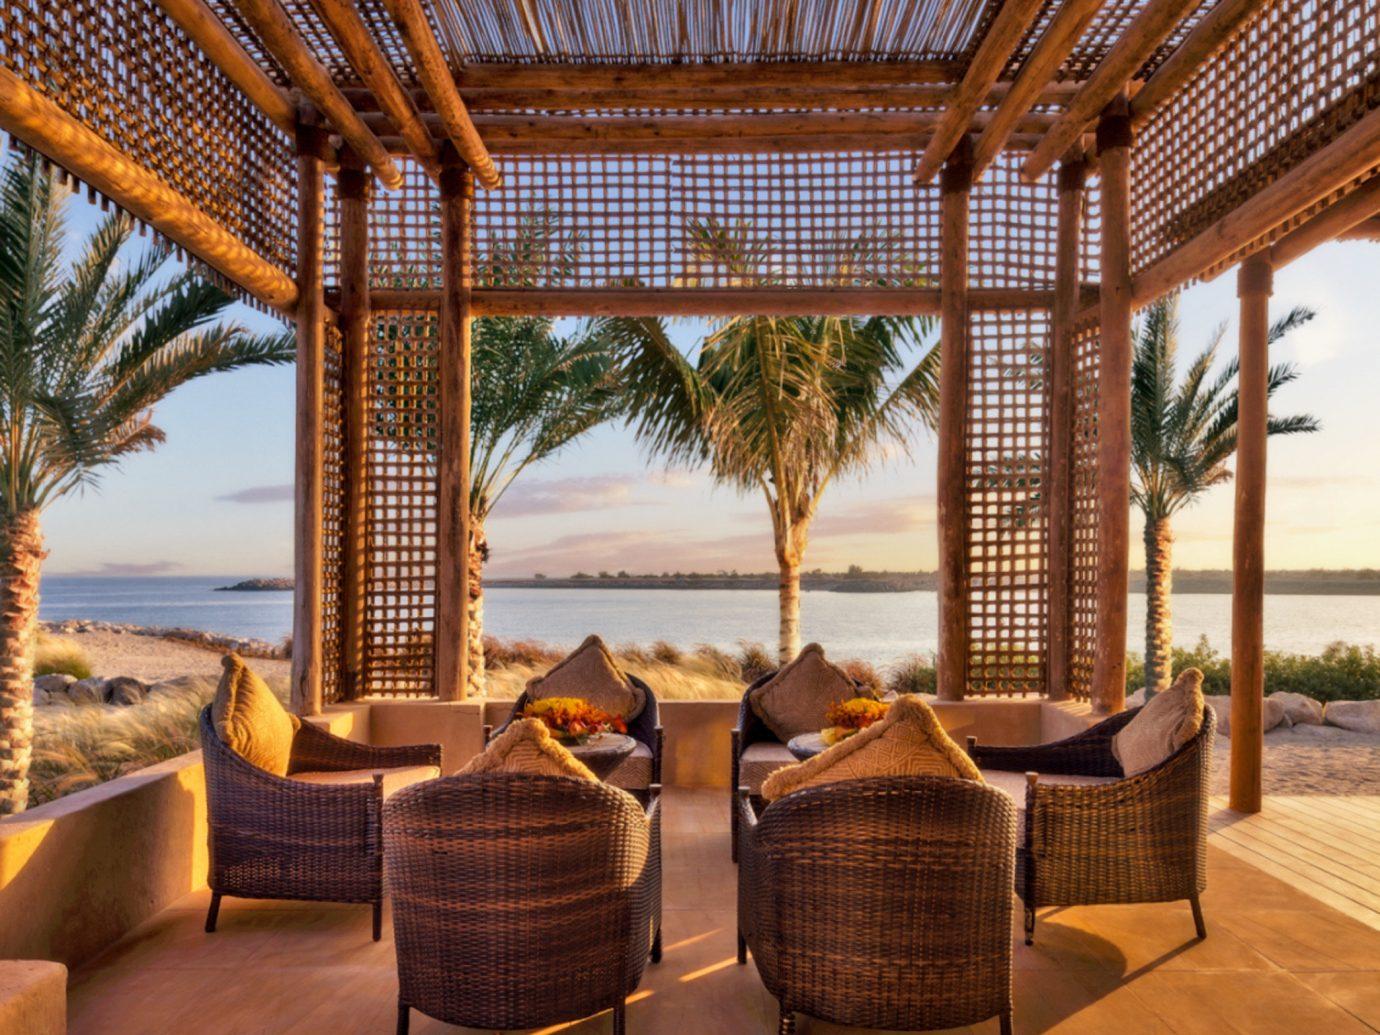 Beach Living Lounge Luxury Scenic views Secret Getaways Trip Ideas property chair Resort room estate outdoor structure Villa wood real estate interior design eco hotel cottage furniture